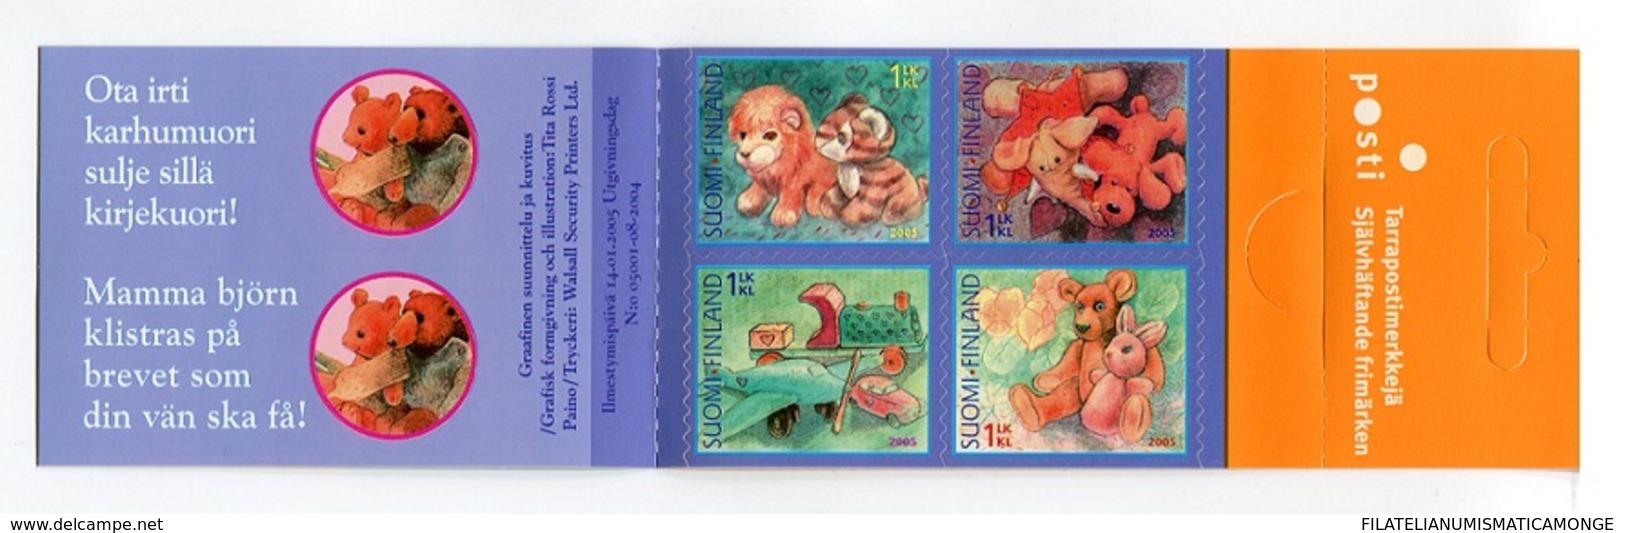 "Finlandia 2005  Yvert Tellier  1693.C Sellos Para Saludos Amistosos ""juguetes"" - Unused Stamps"